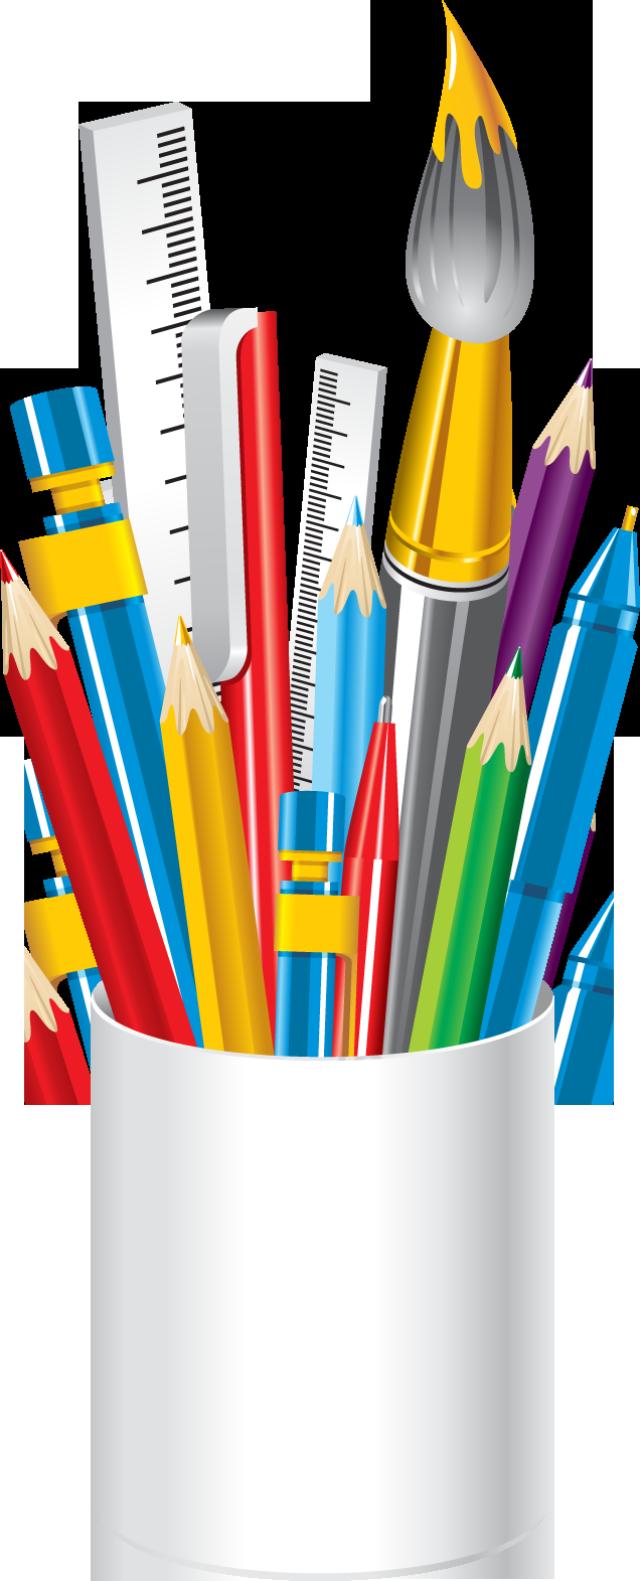 School supplies border free. Crayon clipart suply